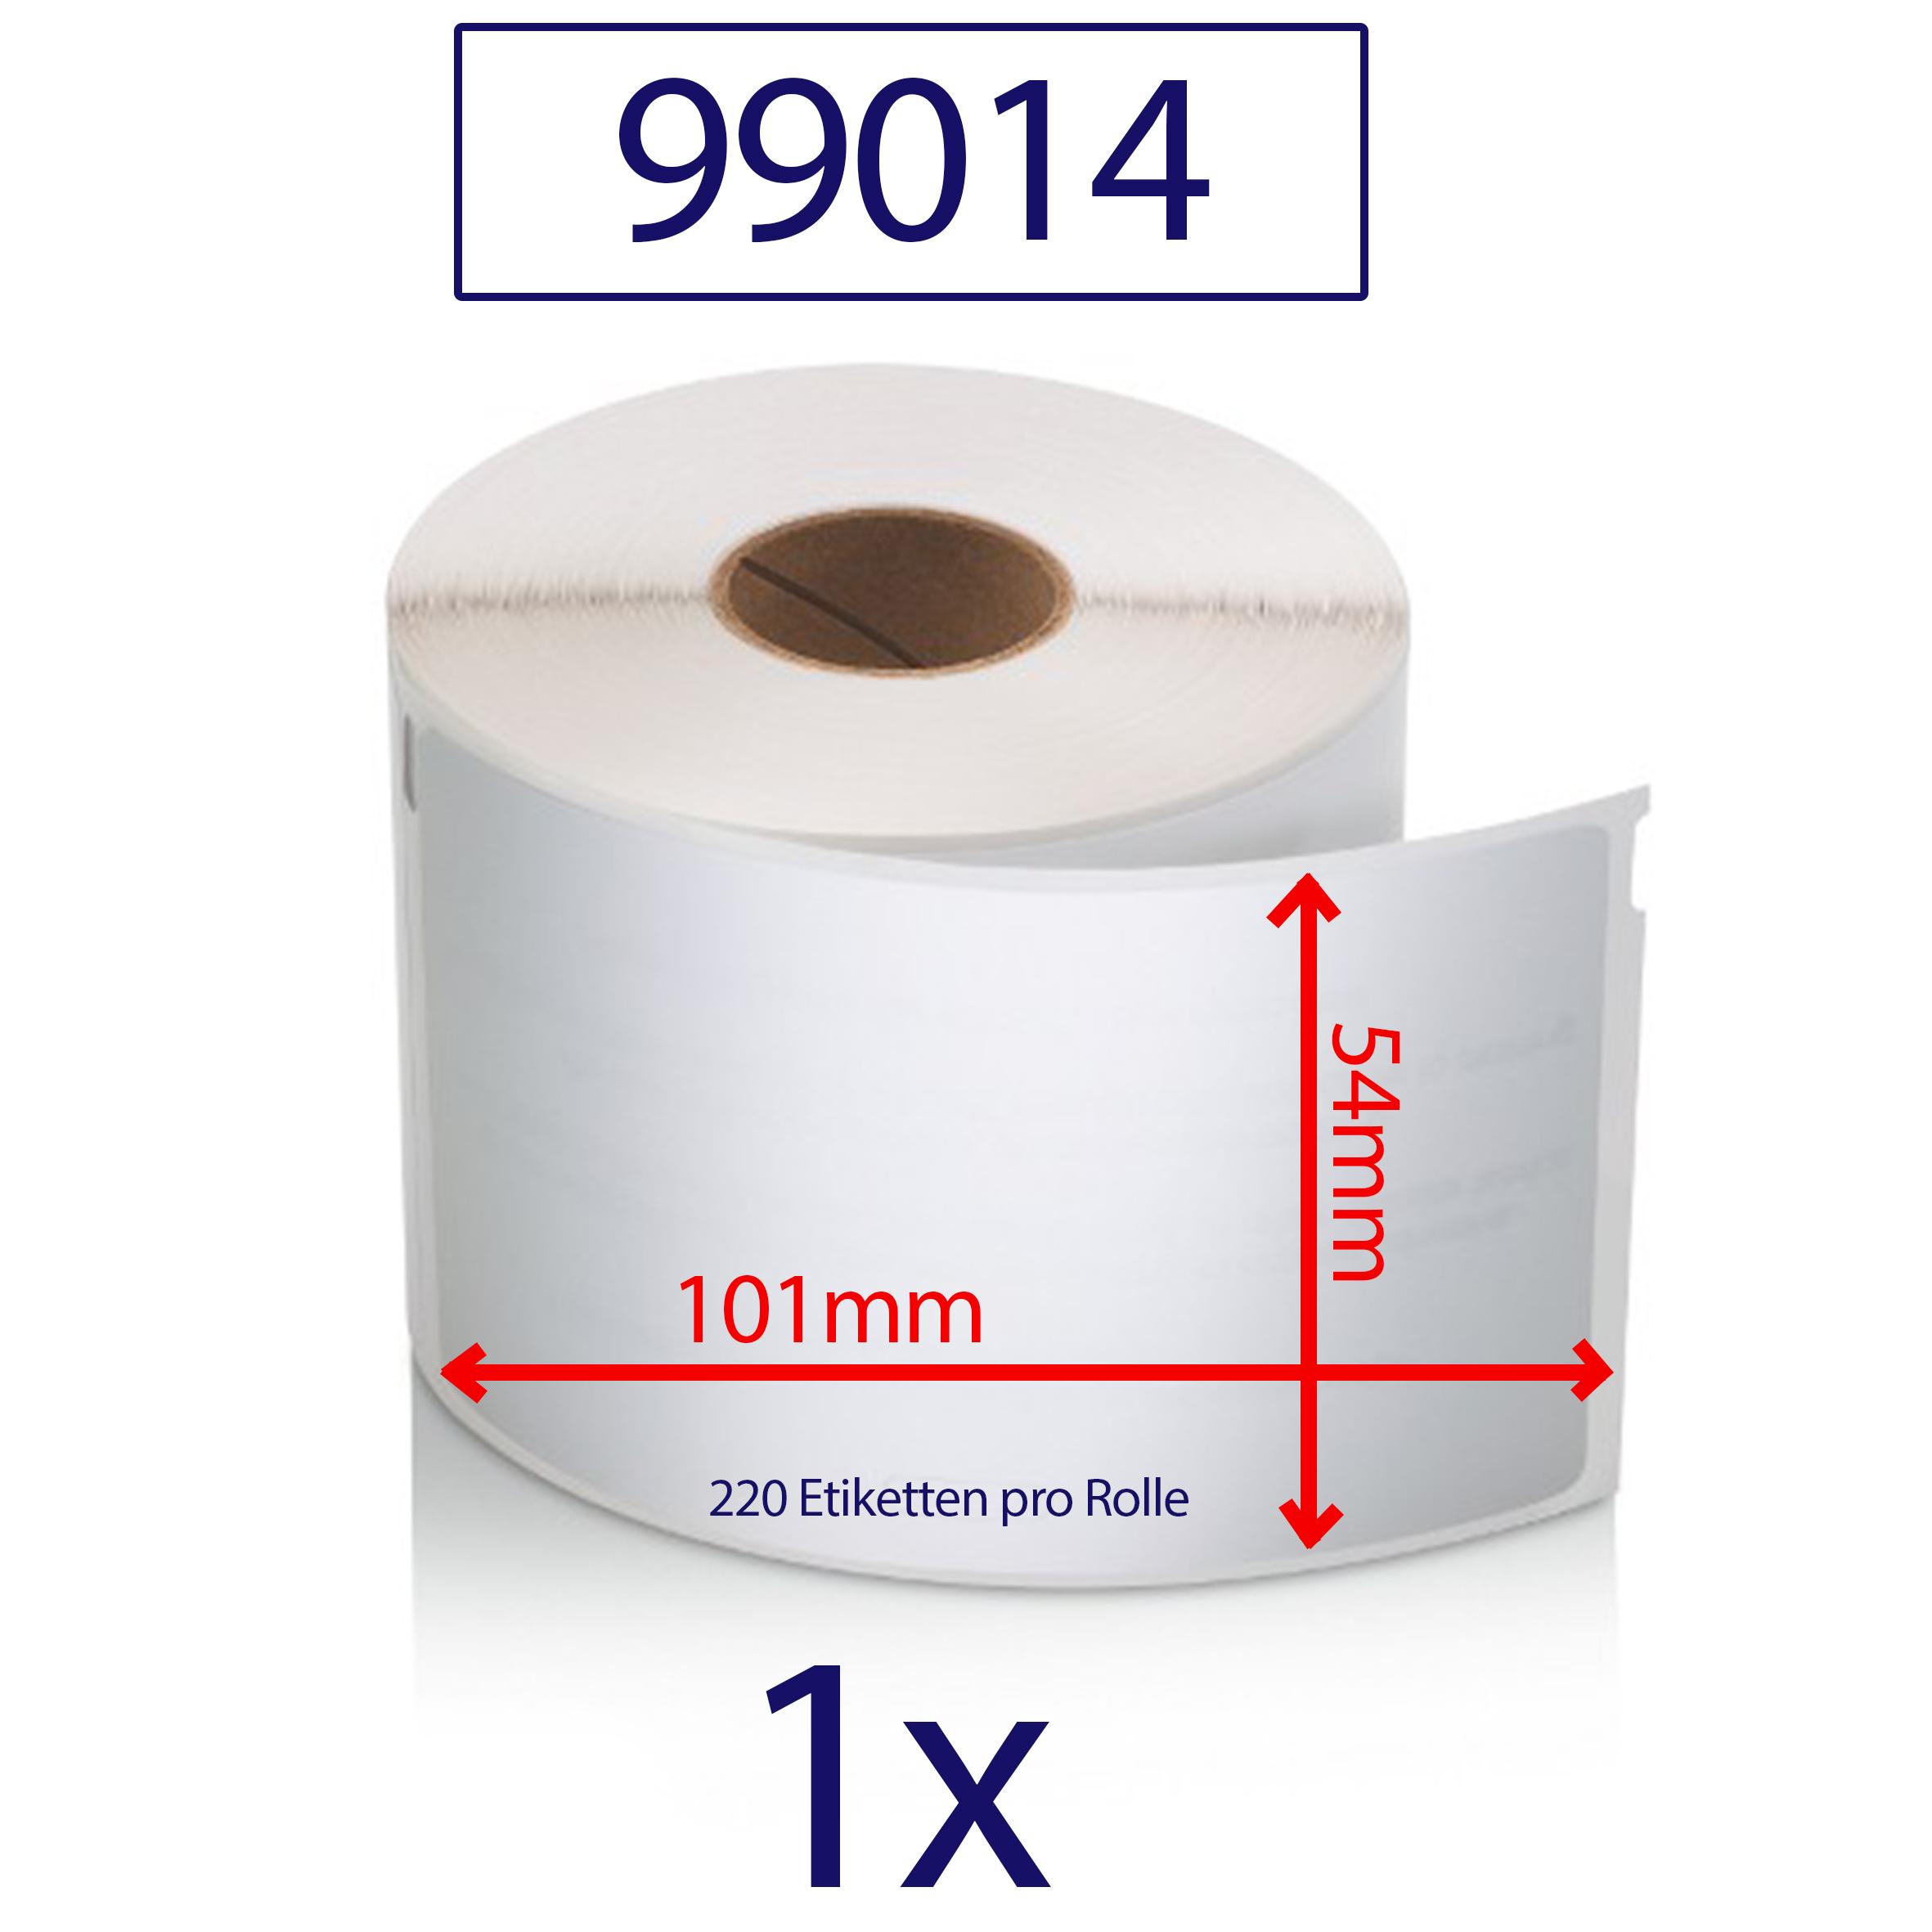 40x Etiketten kompatibel für Dymo 99014 Labelwriter 310 320 330 400 Twin Turbo D